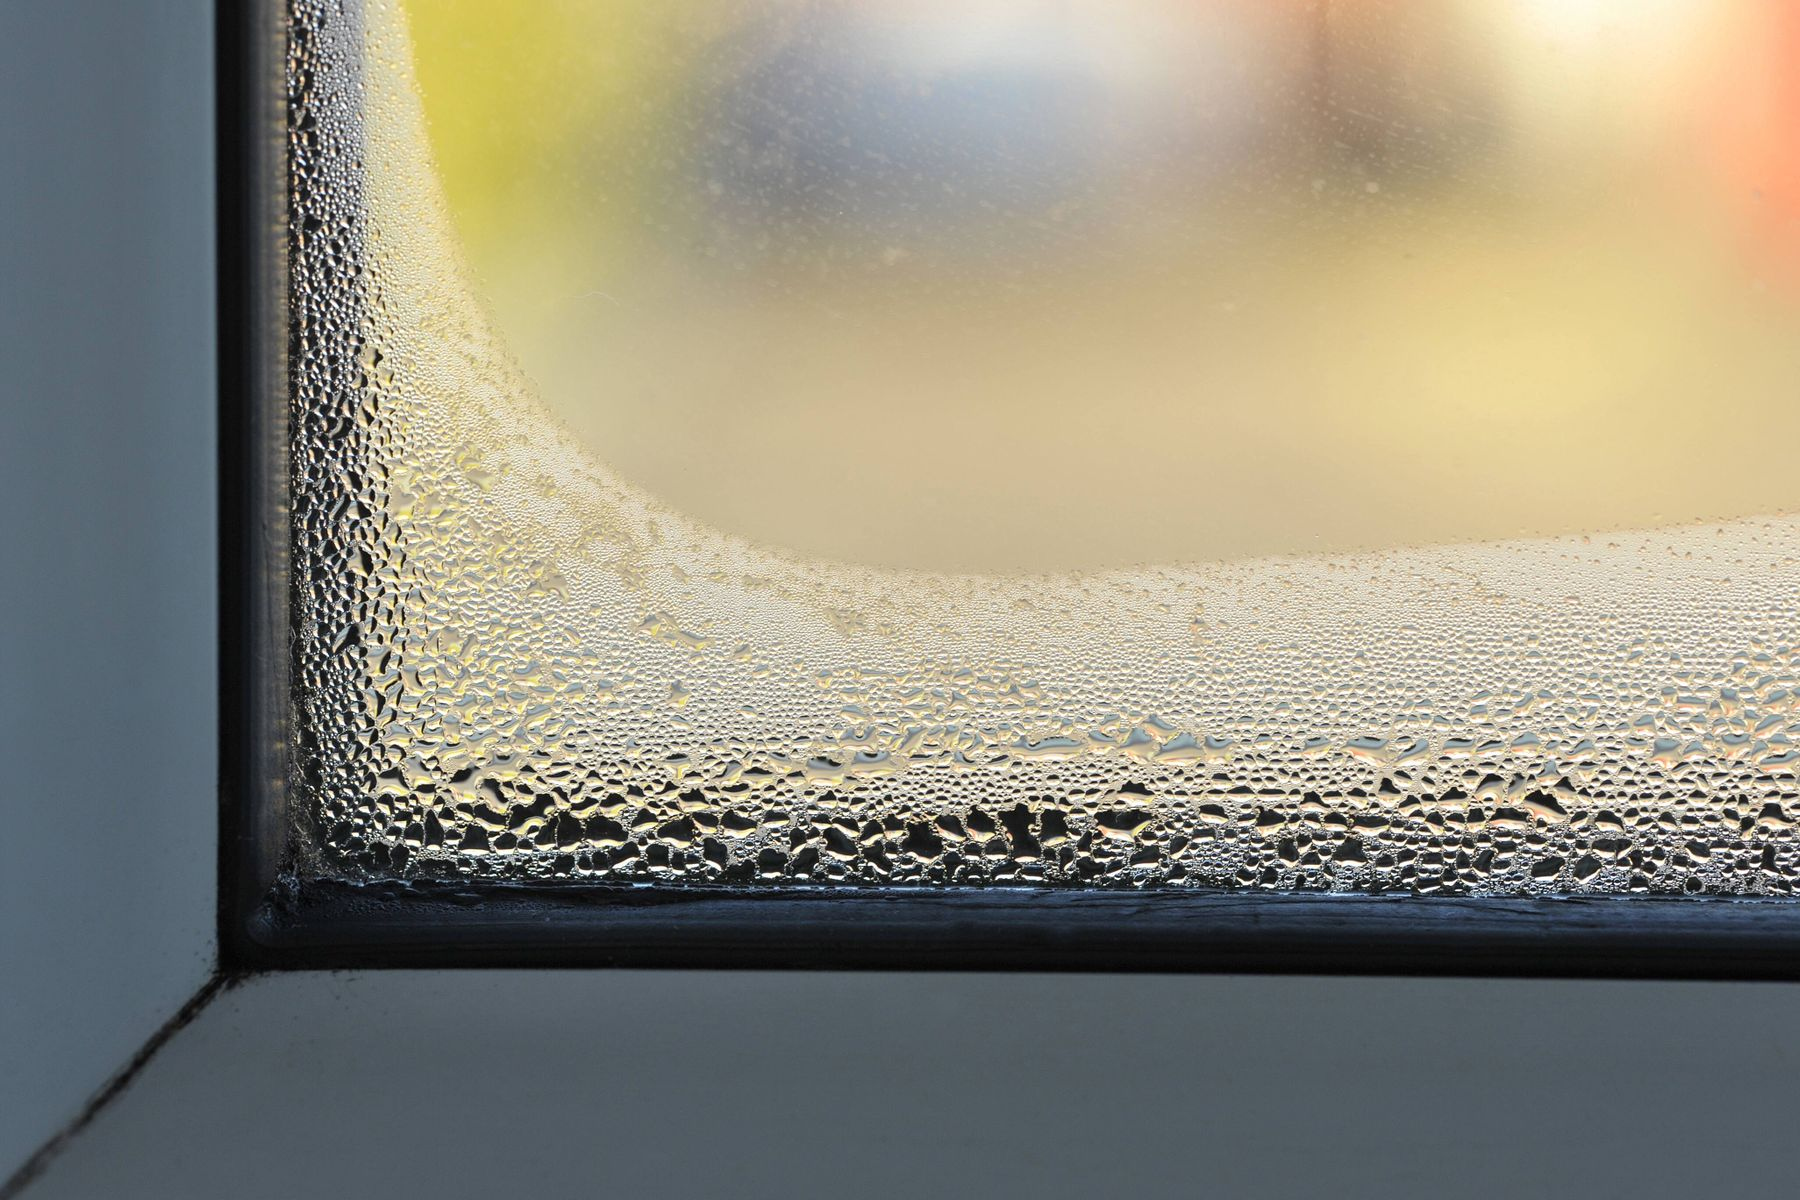 how to get rid off slugs, windon condensation